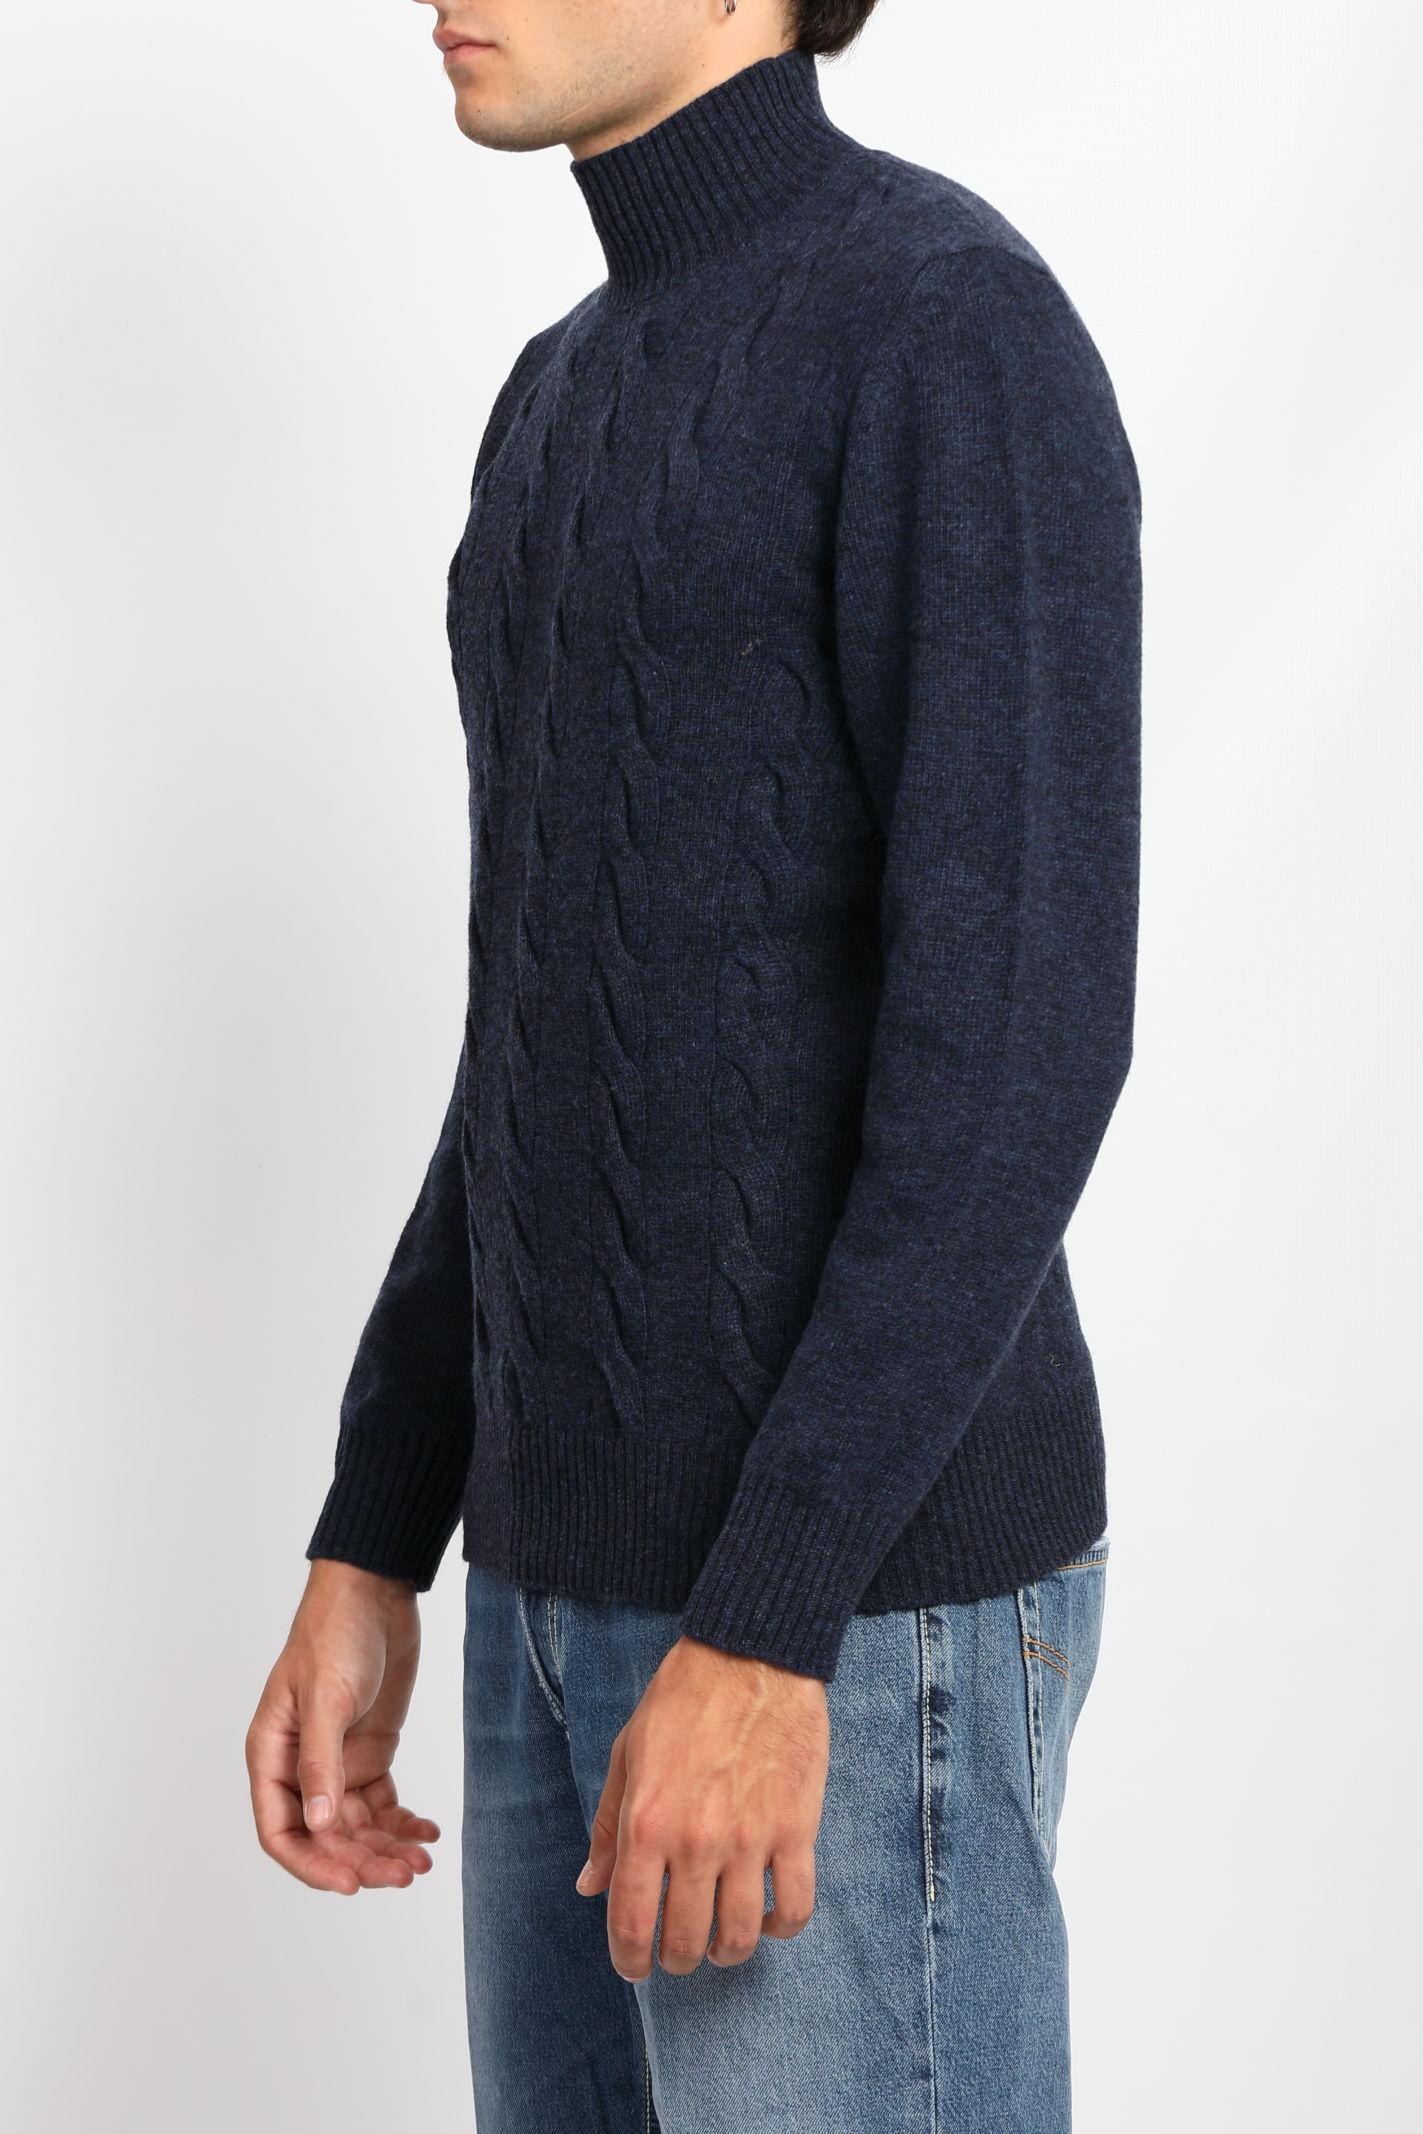 TURTLENECK SWEATER TAGLIATORE | Knitwear | MDLLATRE-PWI21BLU